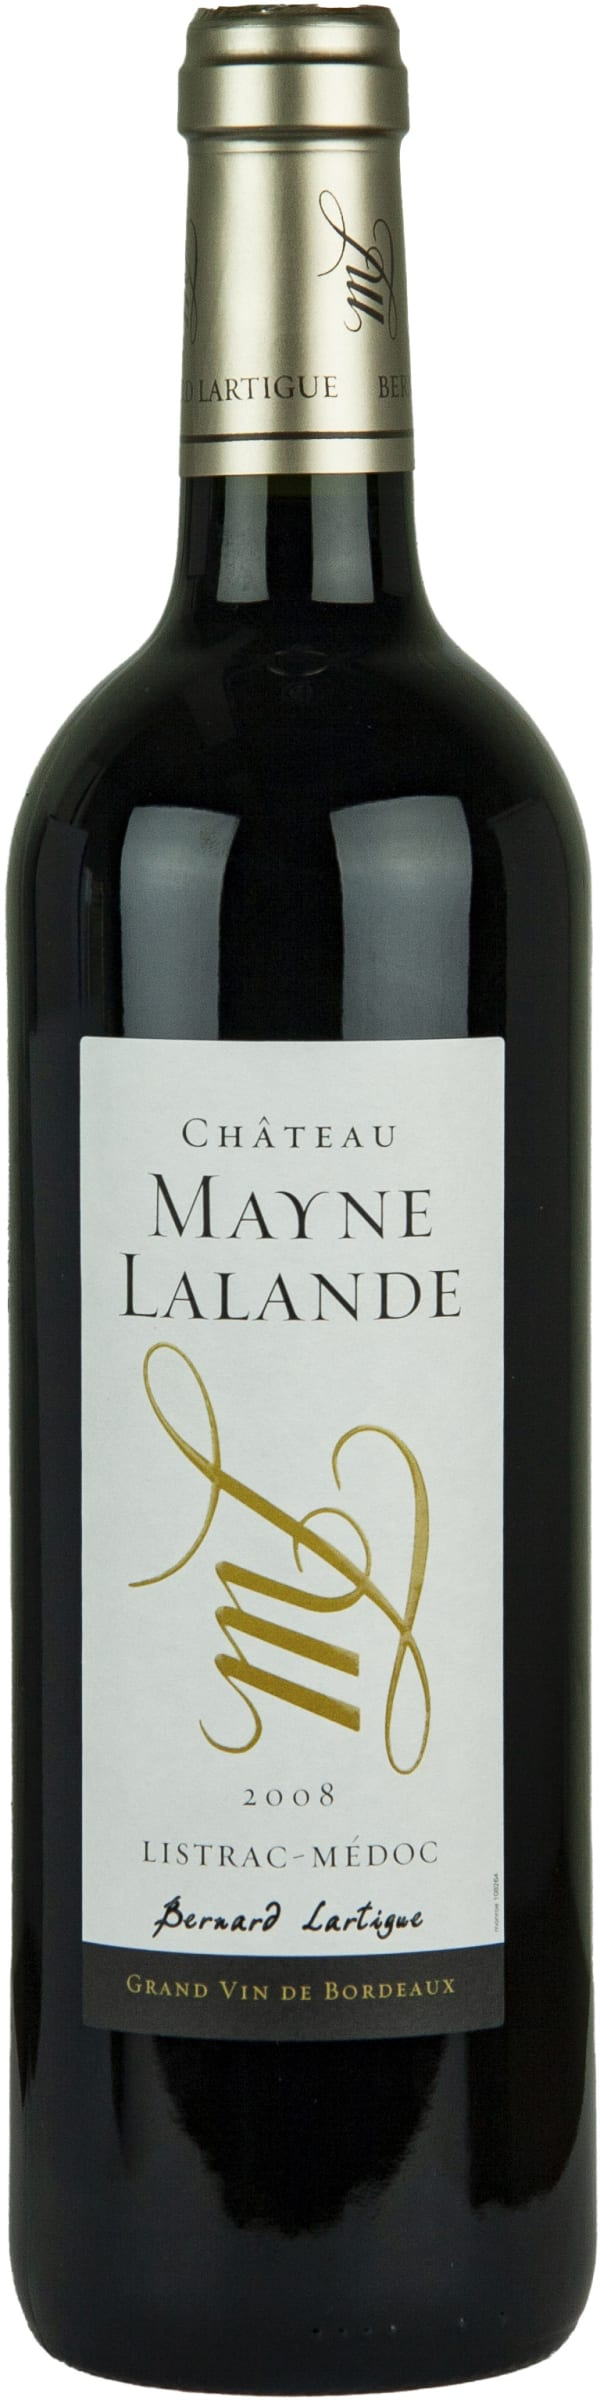 Château Mayne Lalande 2008